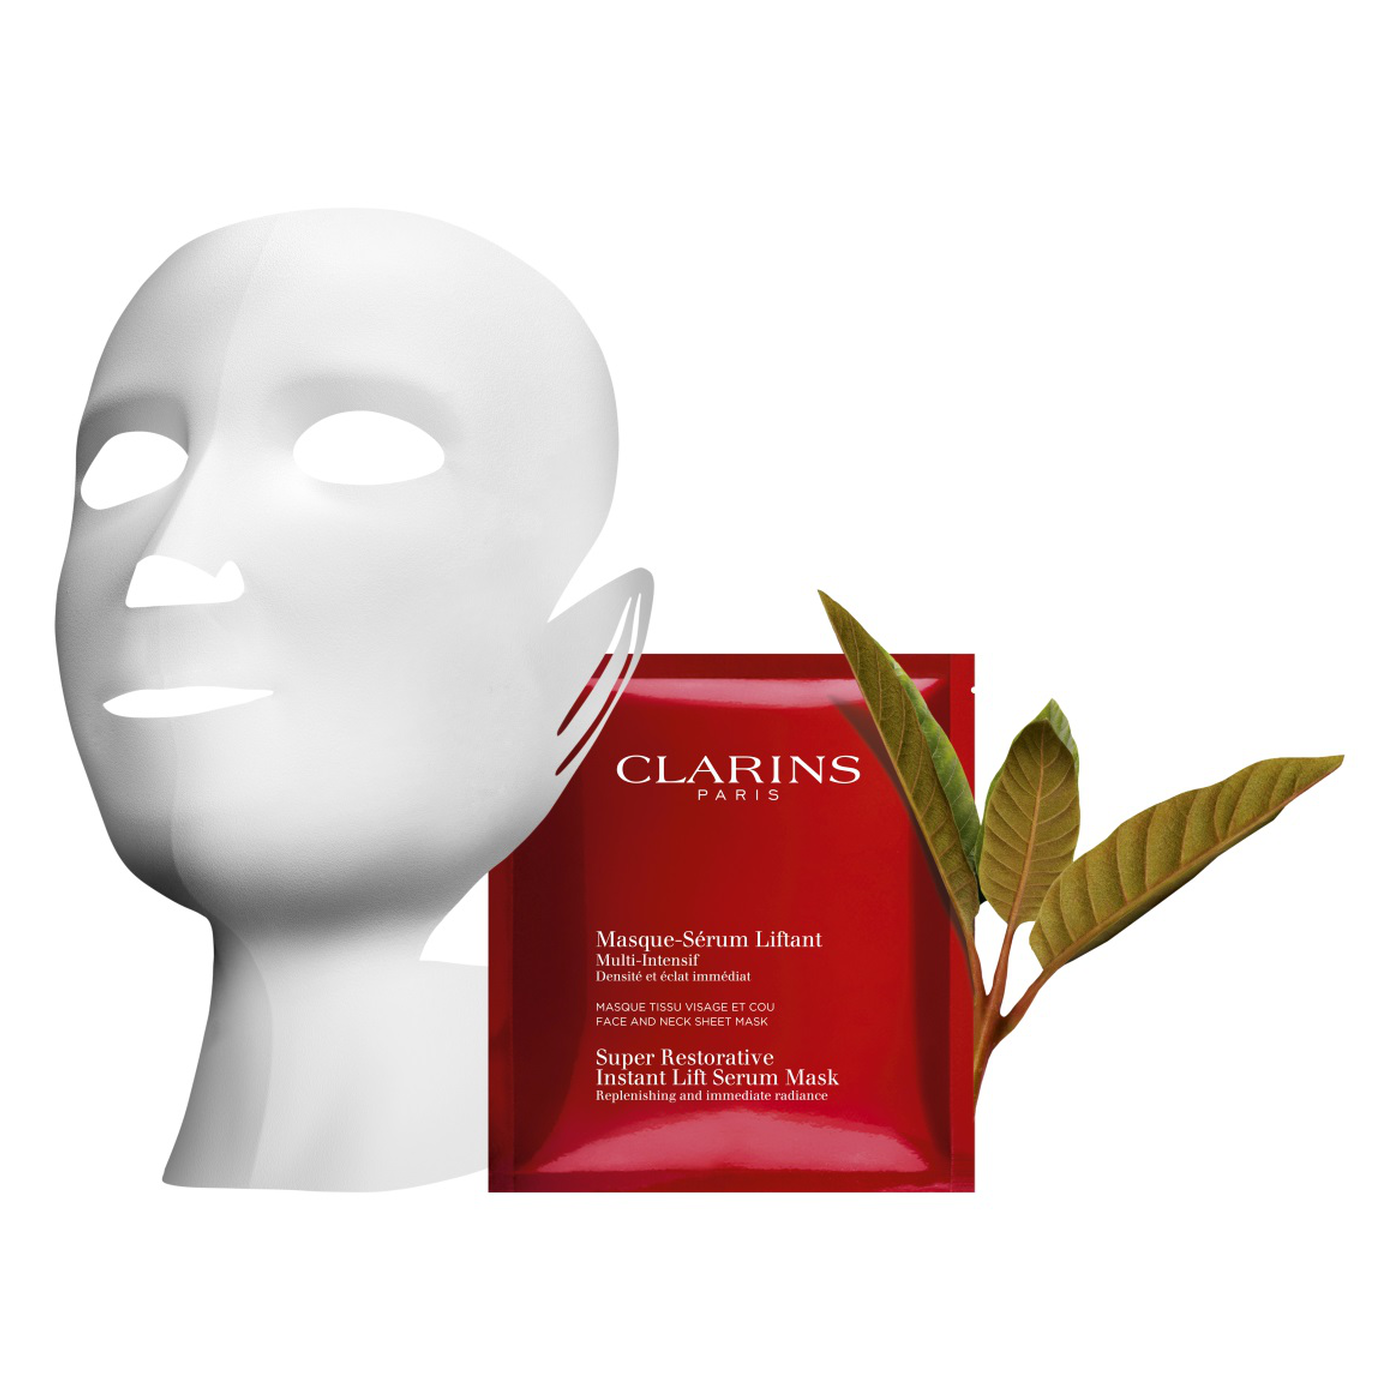 Super Restorative Instant Lift Serum Mask by Clarins #19